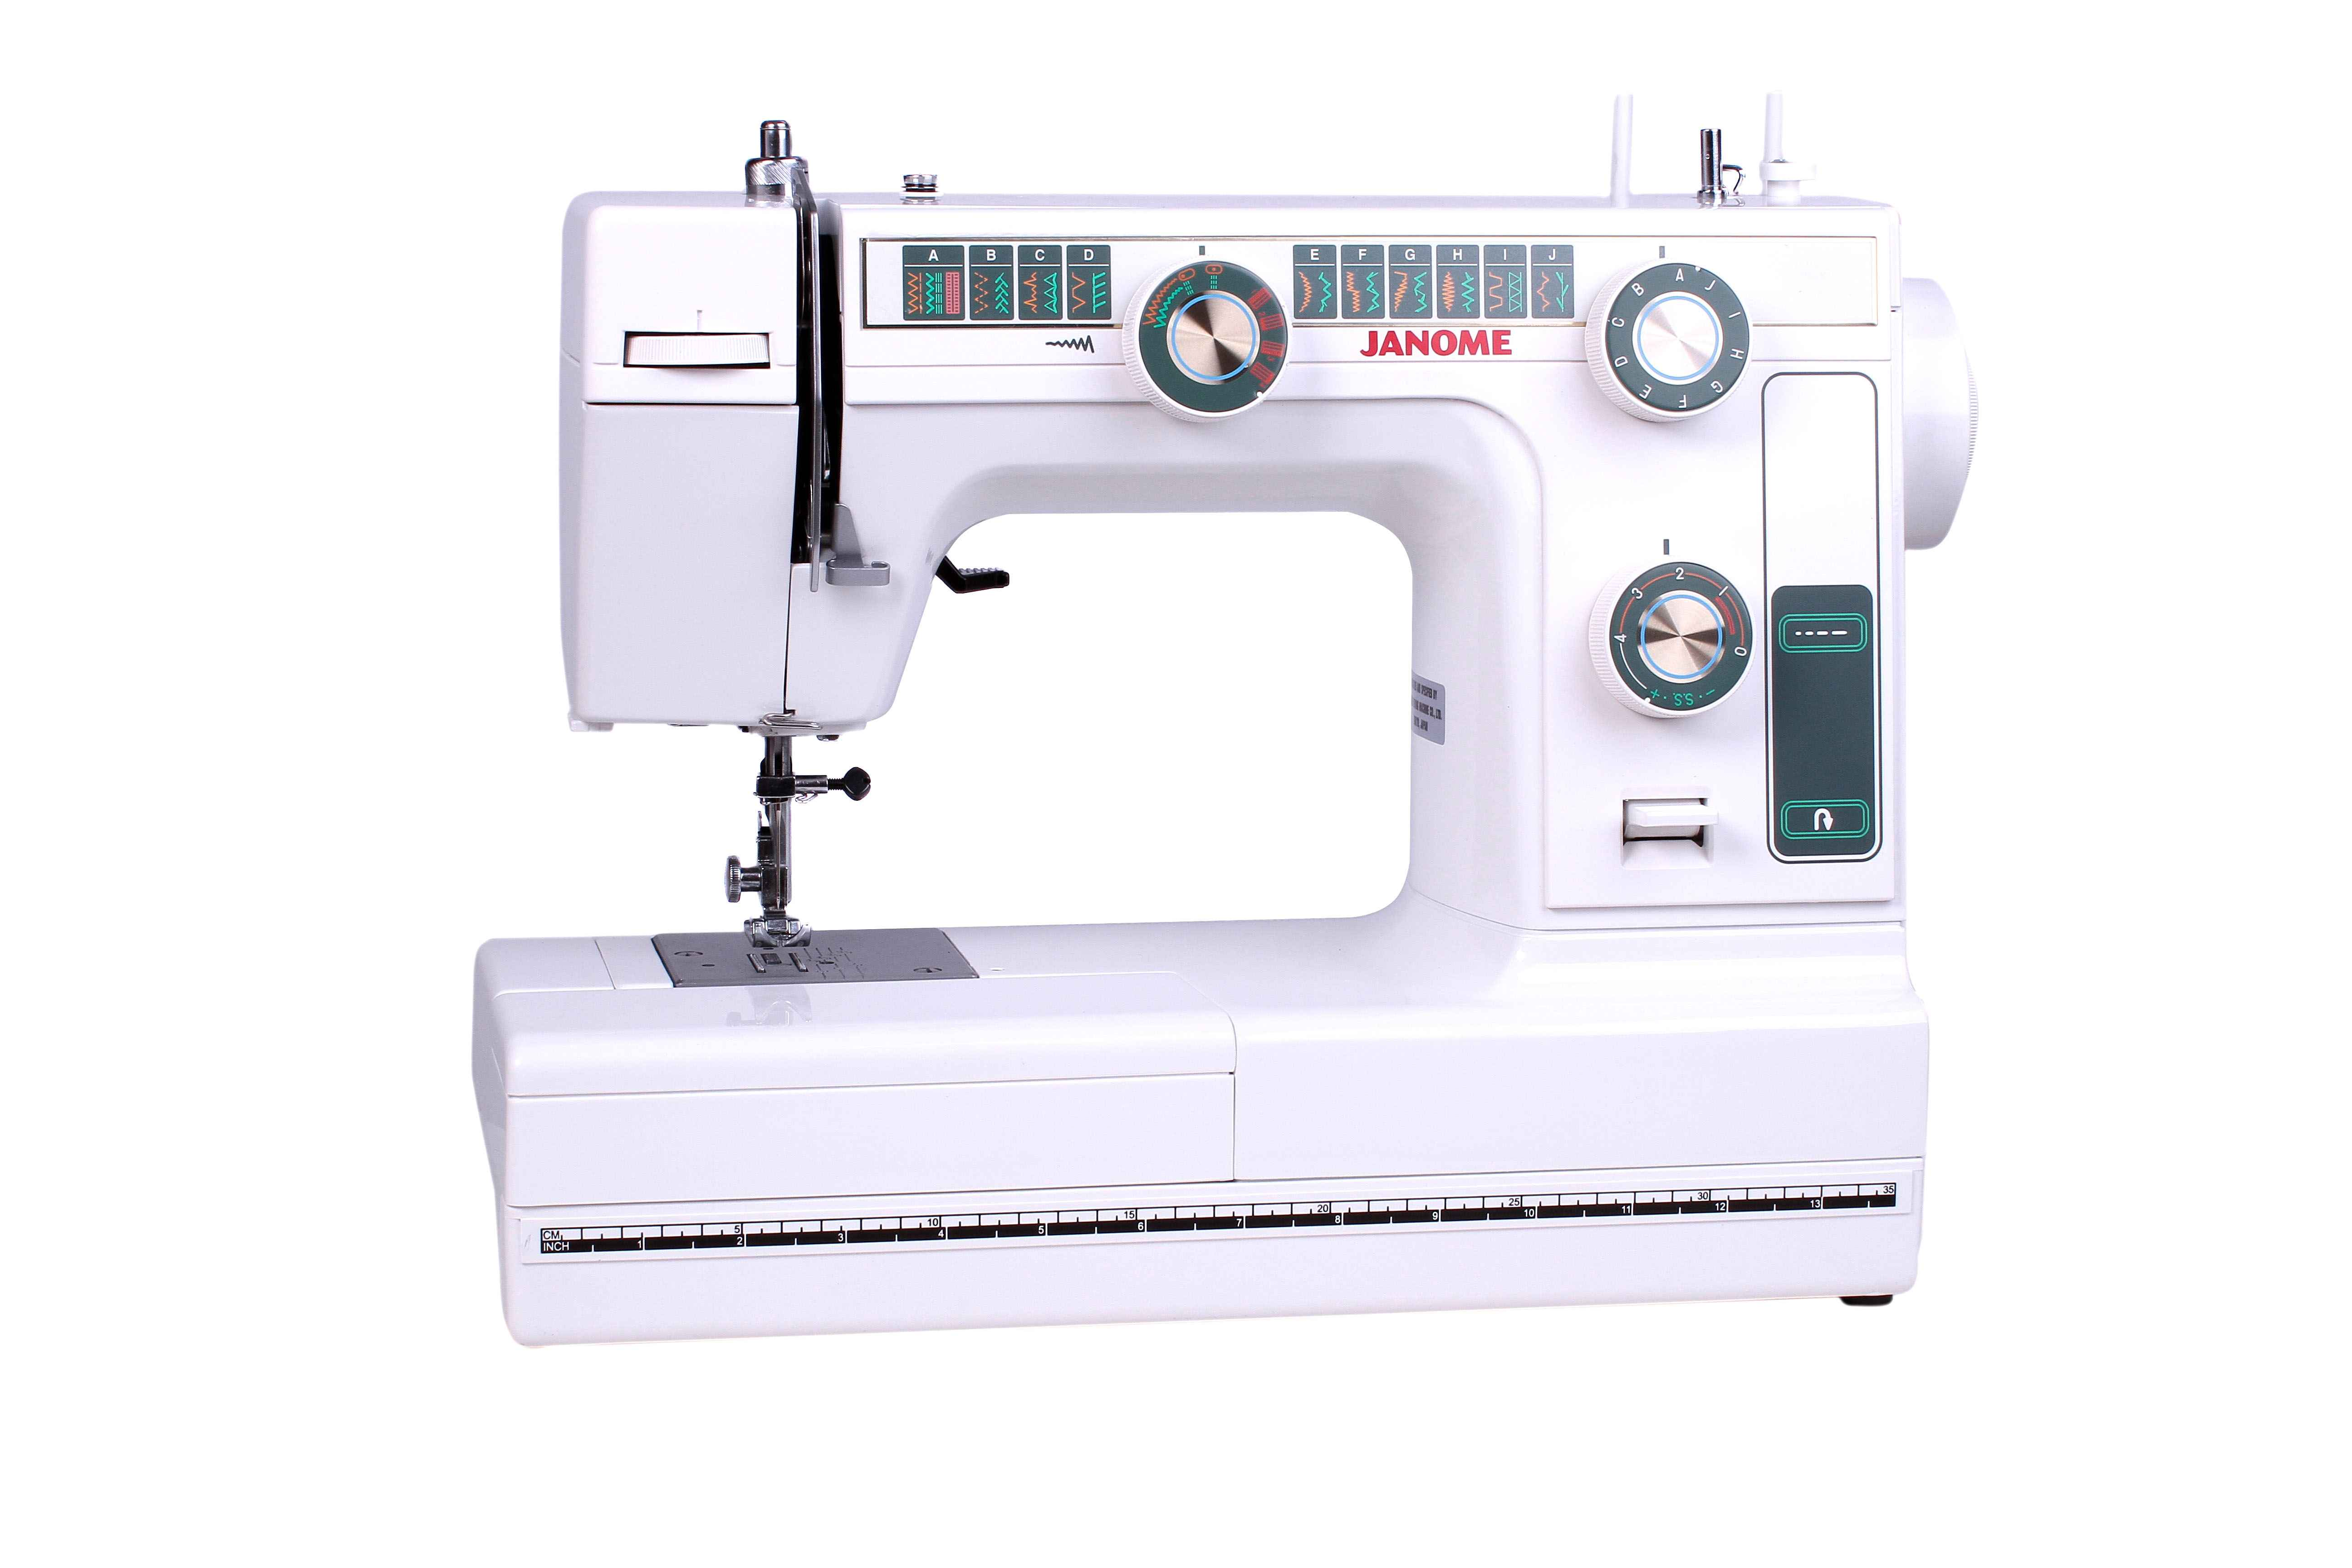 Швейная машина Janome LE 22 / L394 цены онлайн